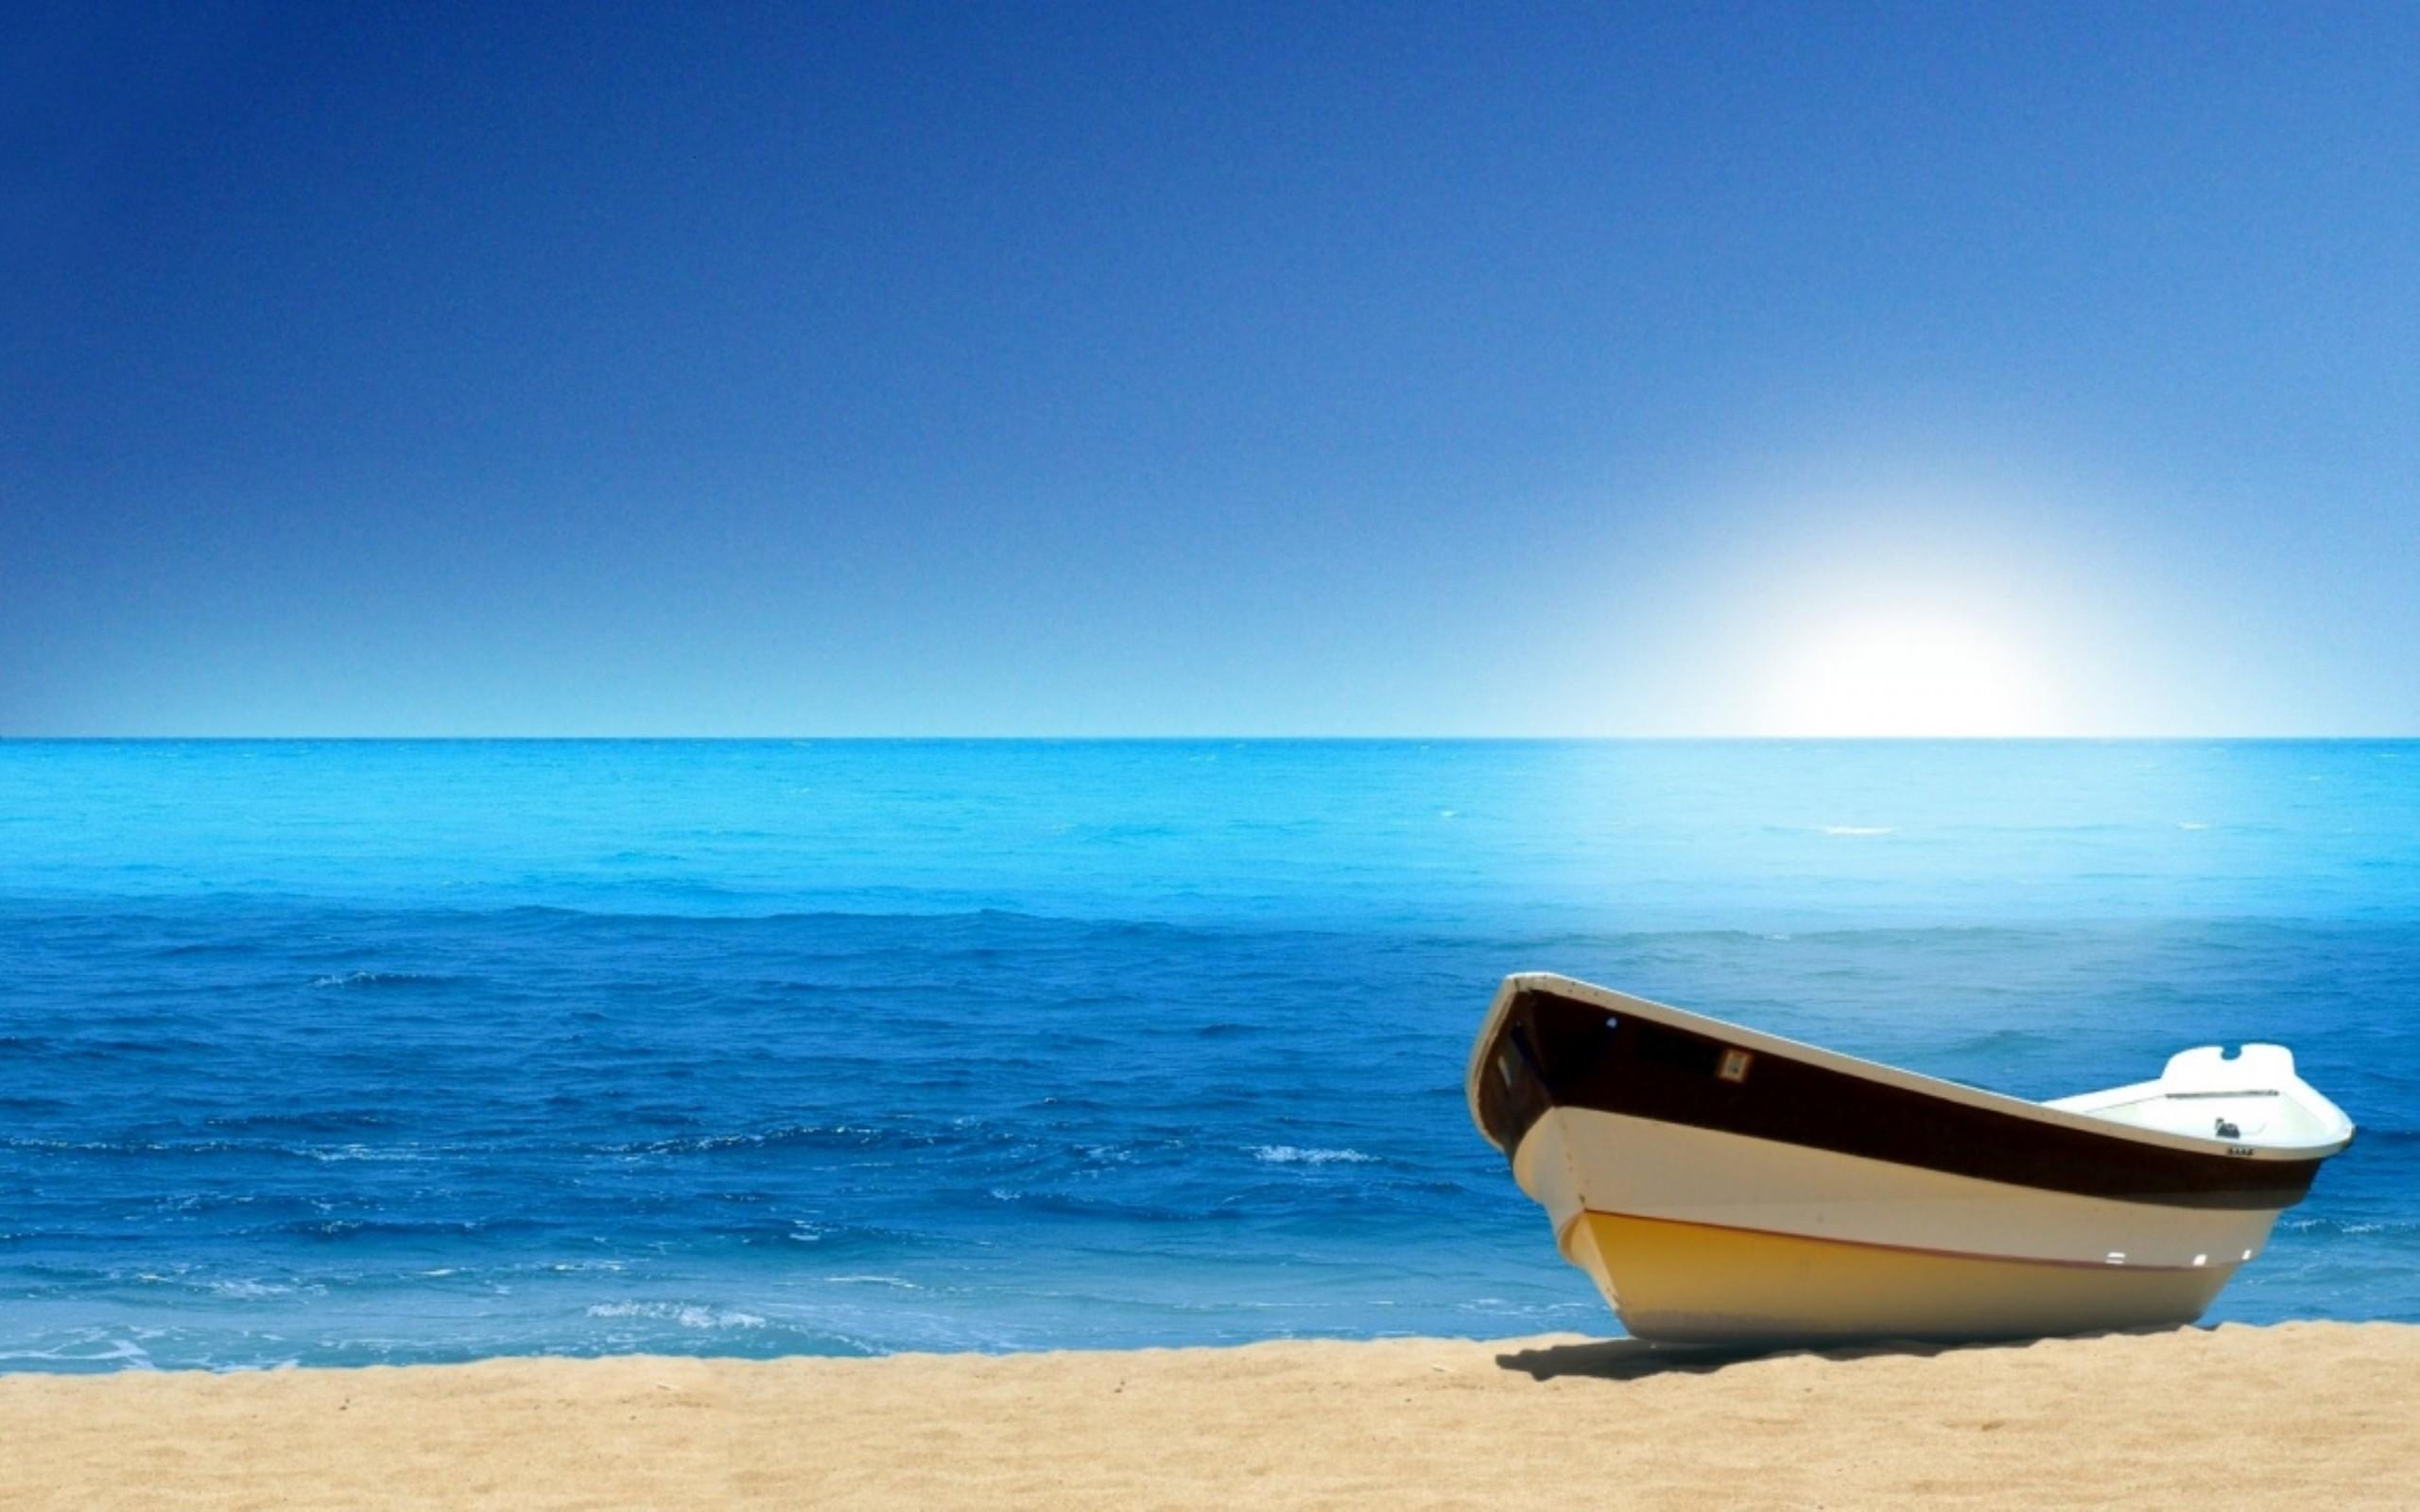 Res: 2560x1600, Boat Blue Ocean Beach Wallpaper.